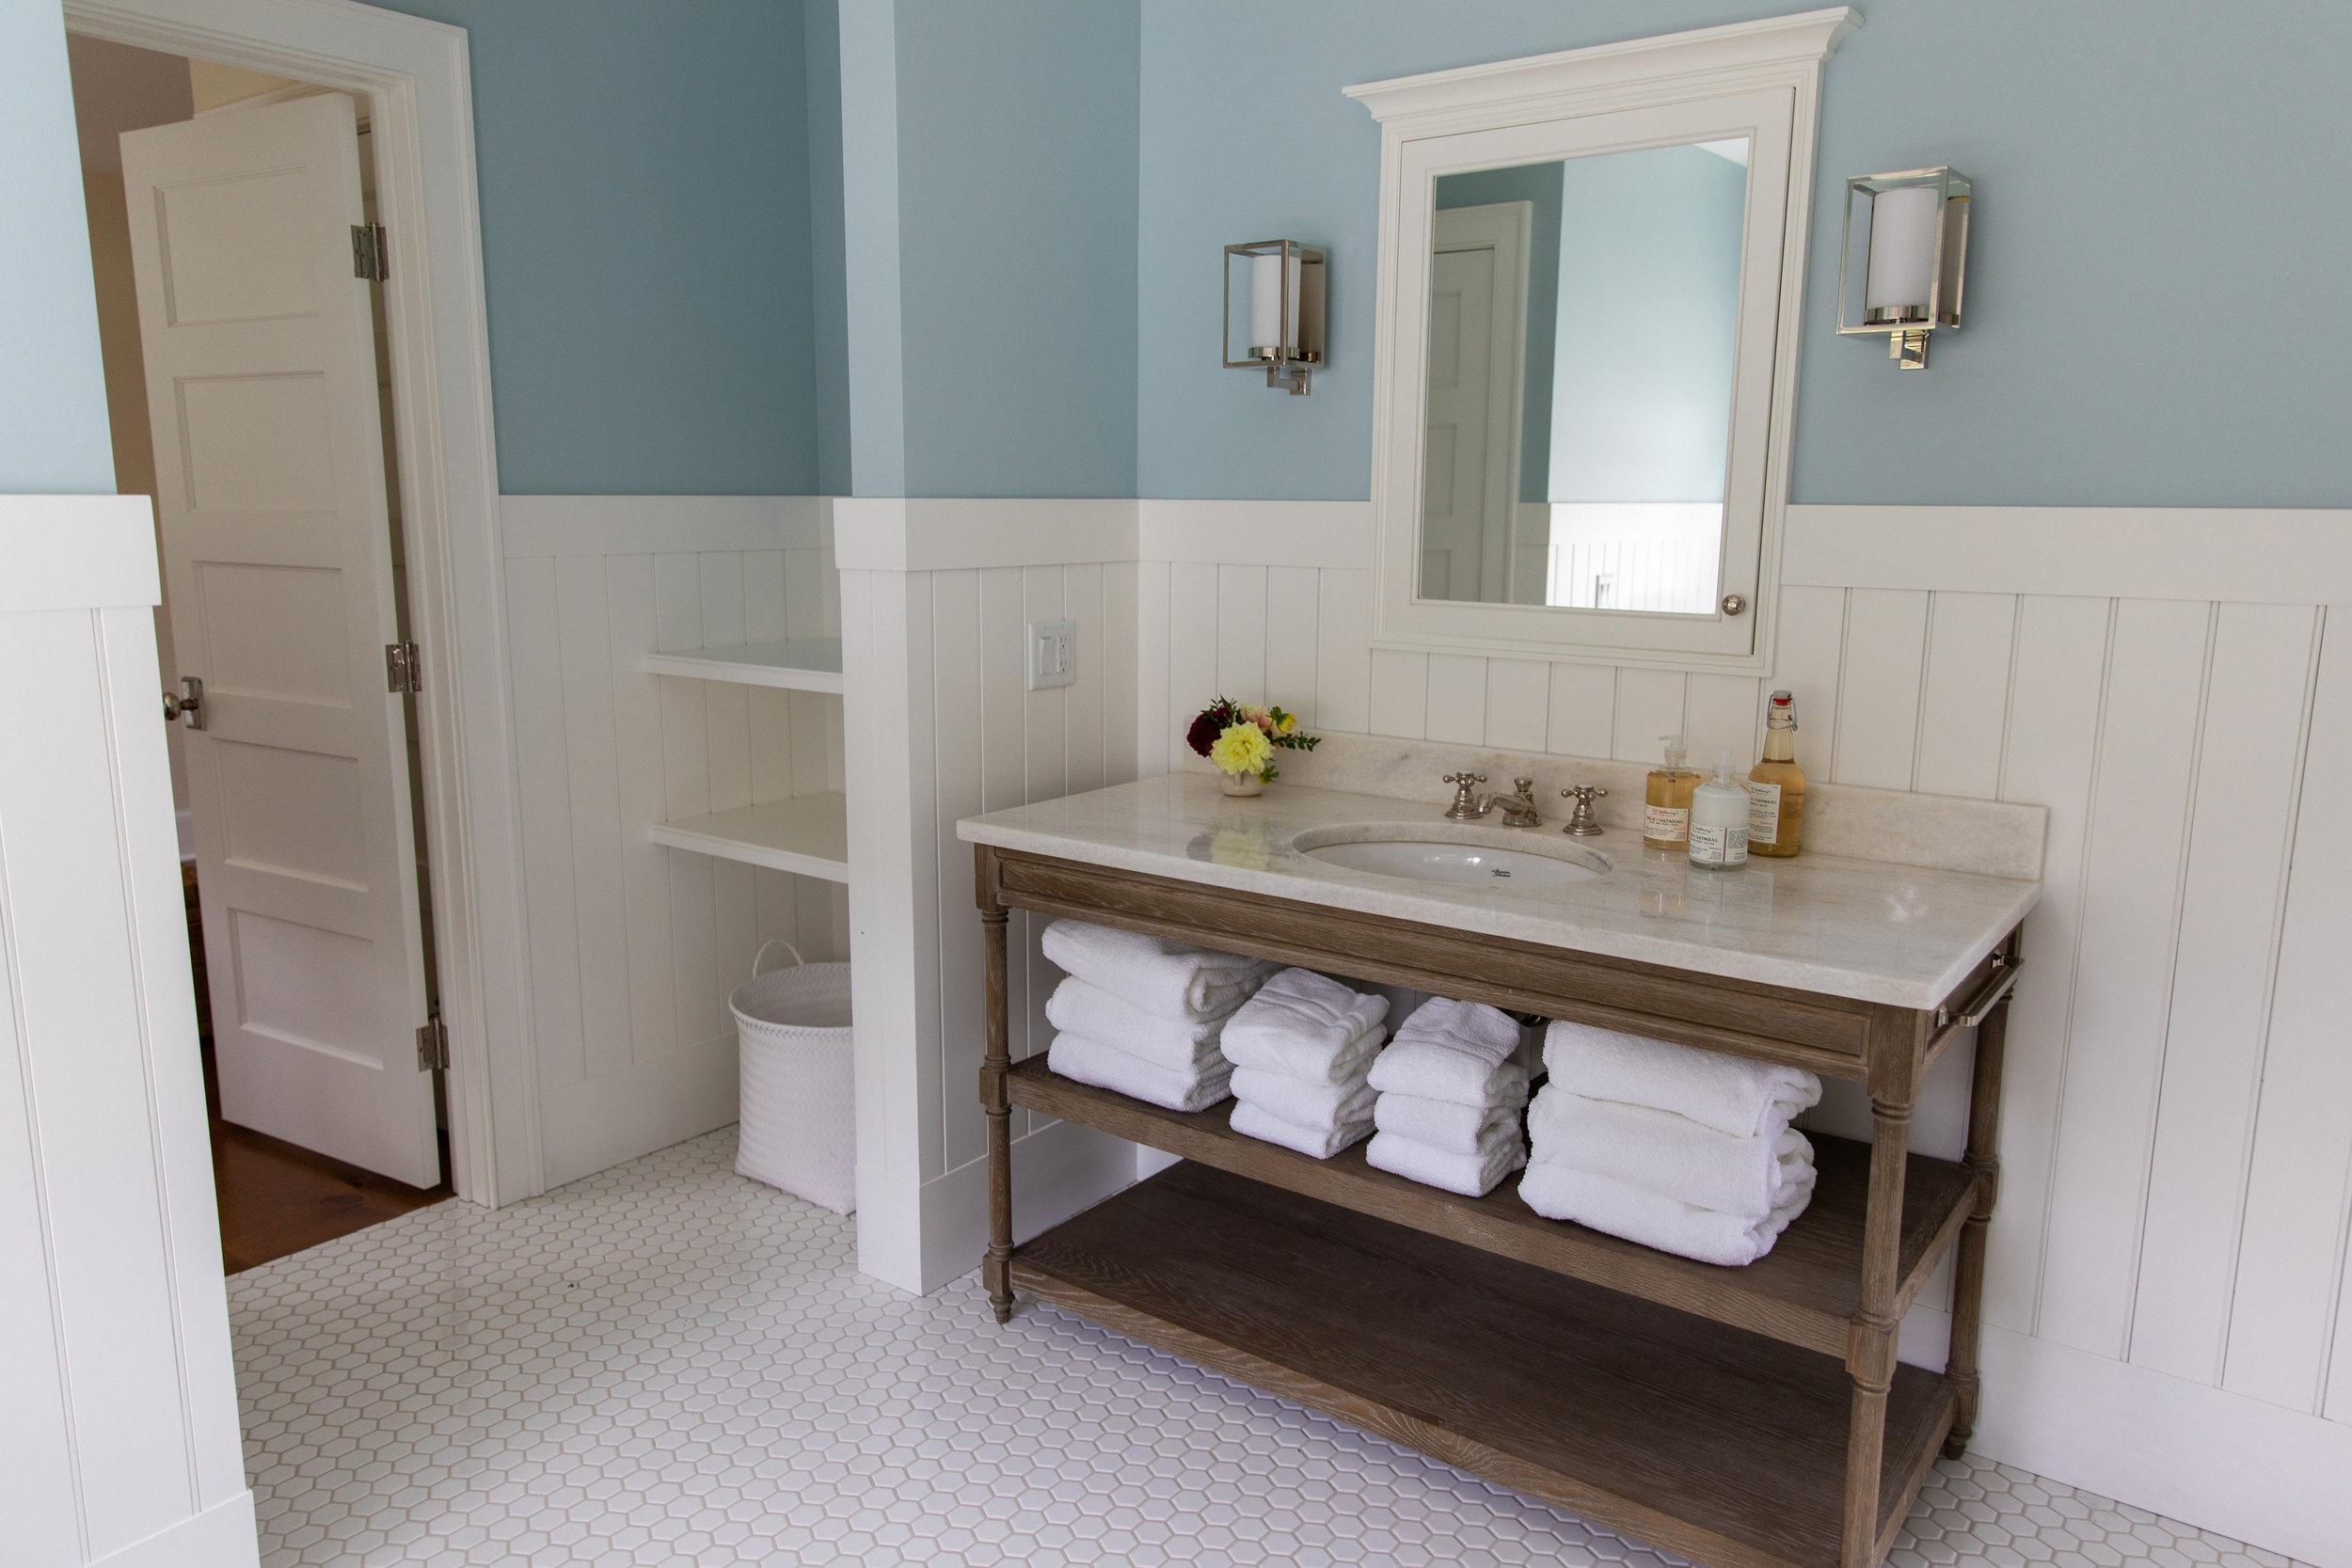 Bathroom-storage-ideas